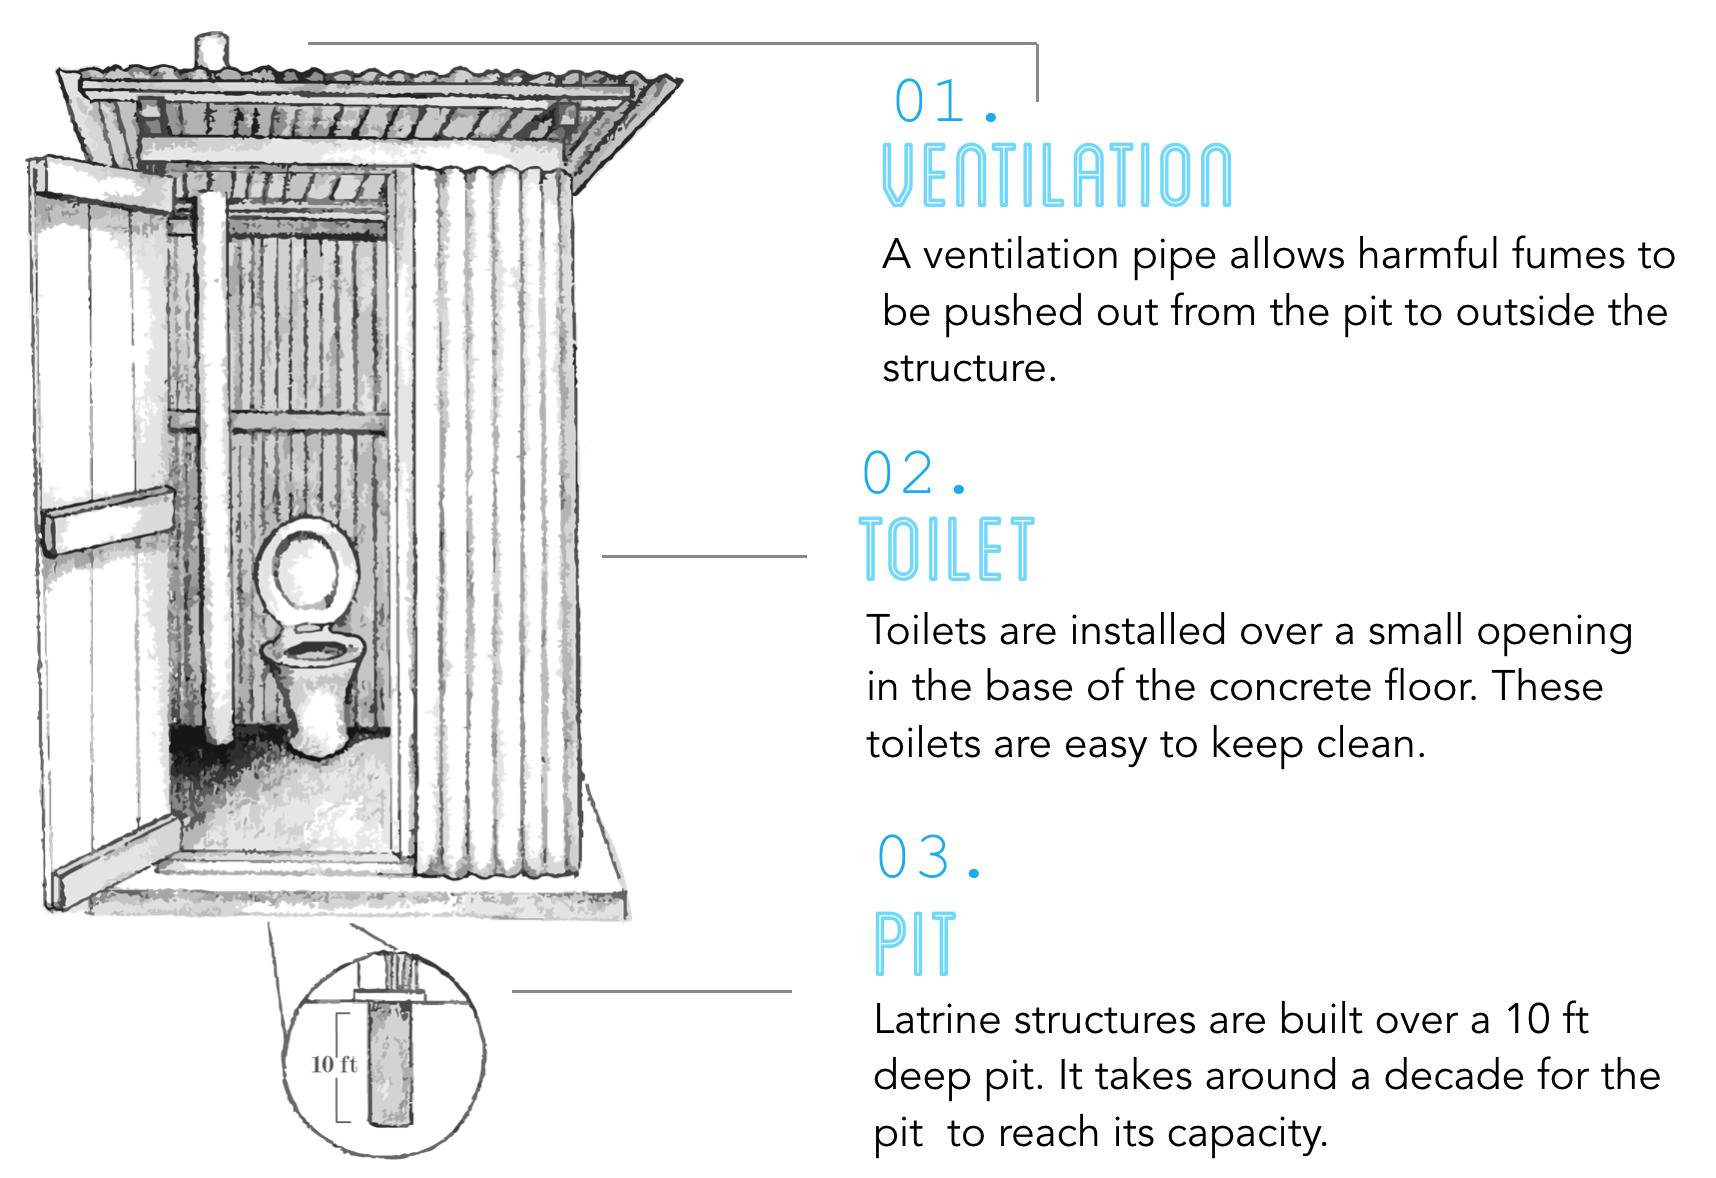 vip-latrine-make-the-world-blue